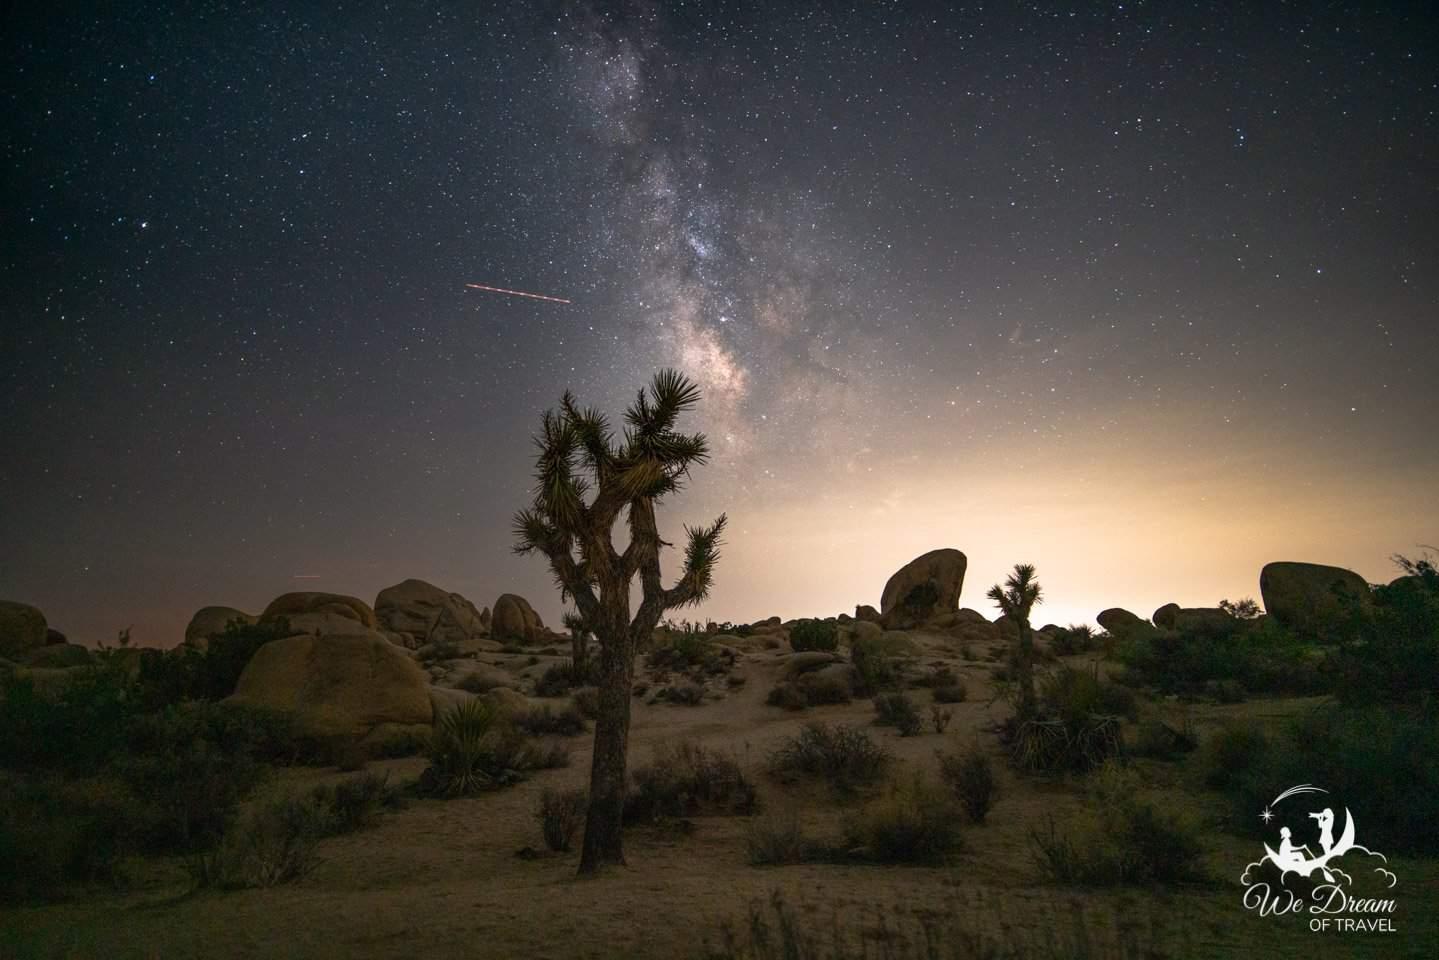 The Milky Way Galactic Core cascades beside a Joshua Tree as a redeye flight blows through the frame.